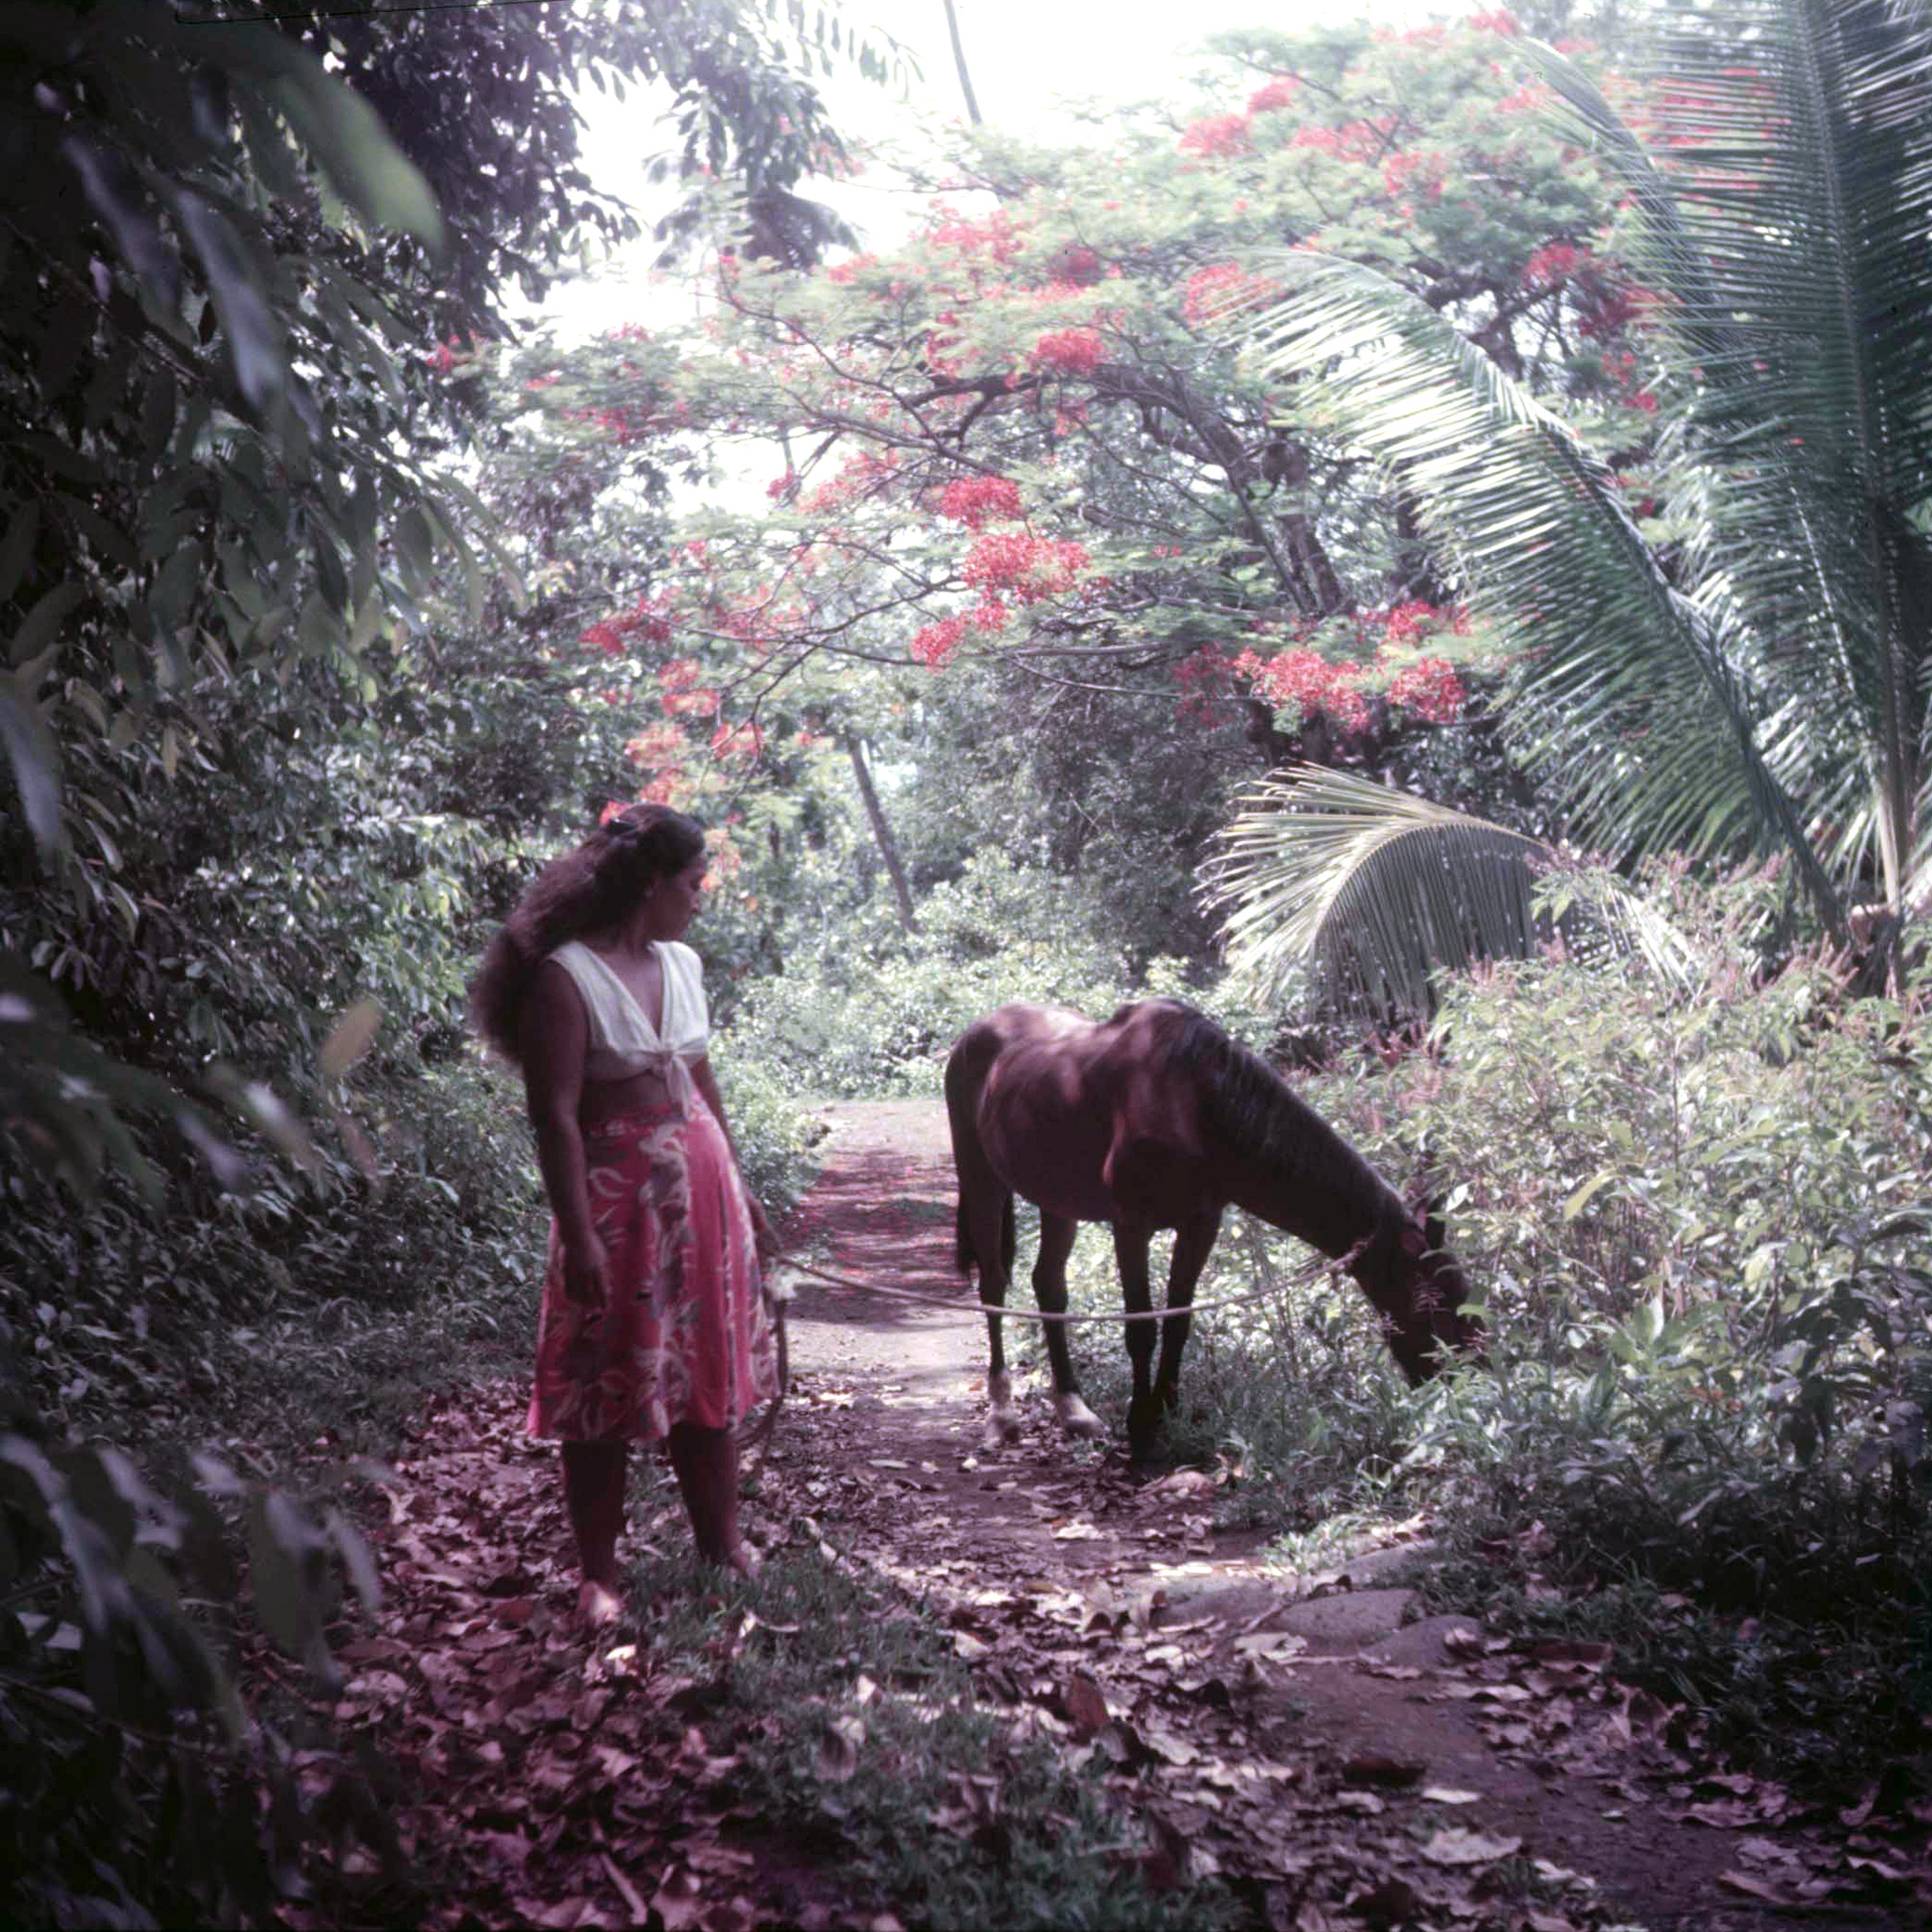 A Tahitian woman walking her horse through the jungle.